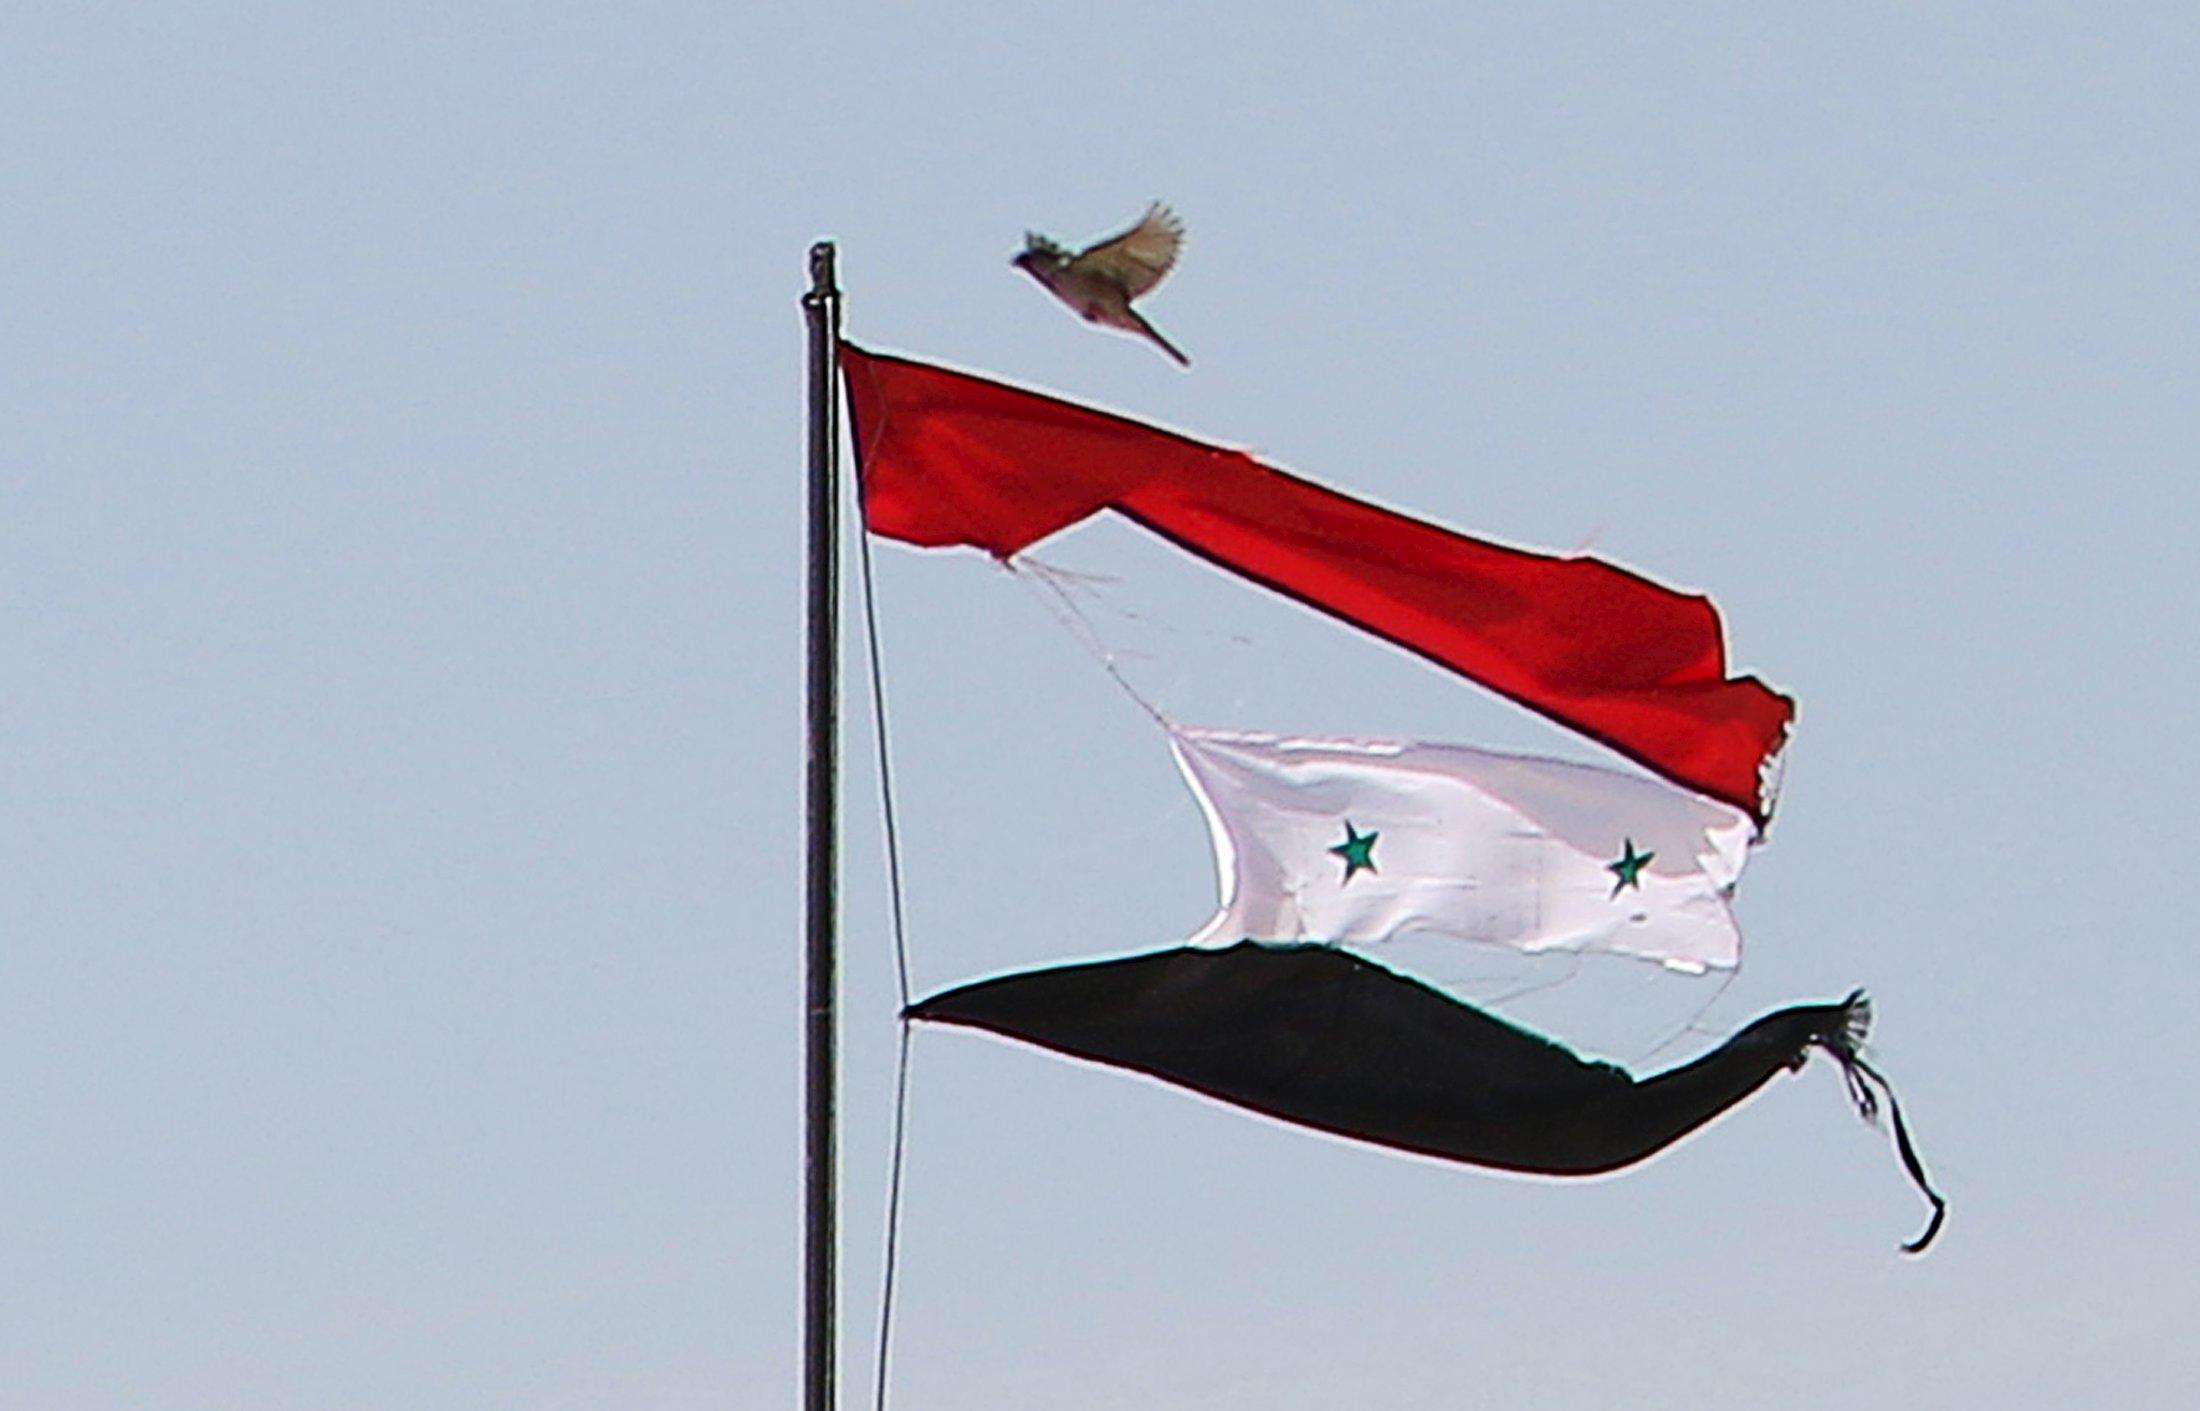 A bird flies near a torn Syrian national flag in the city of Qamishli